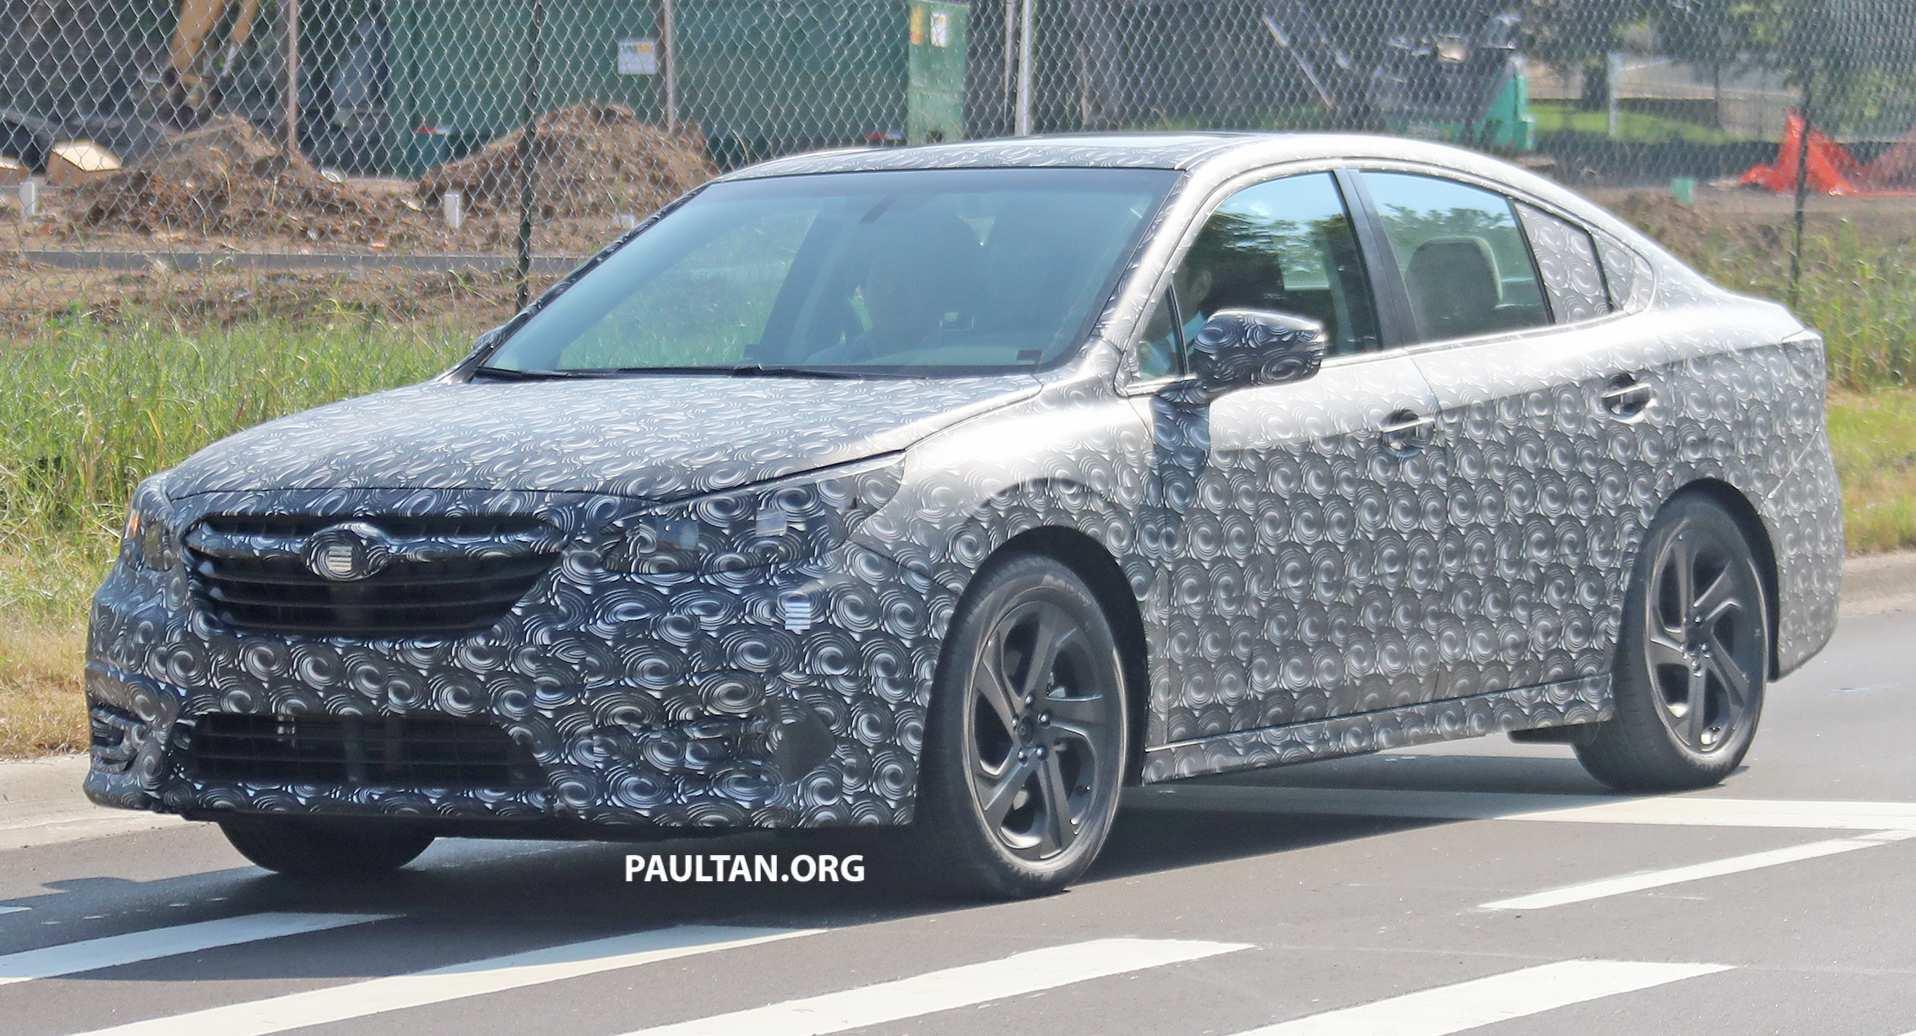 66 All New Subaru Legacy 2020 Japan Spesification for Subaru Legacy 2020 Japan